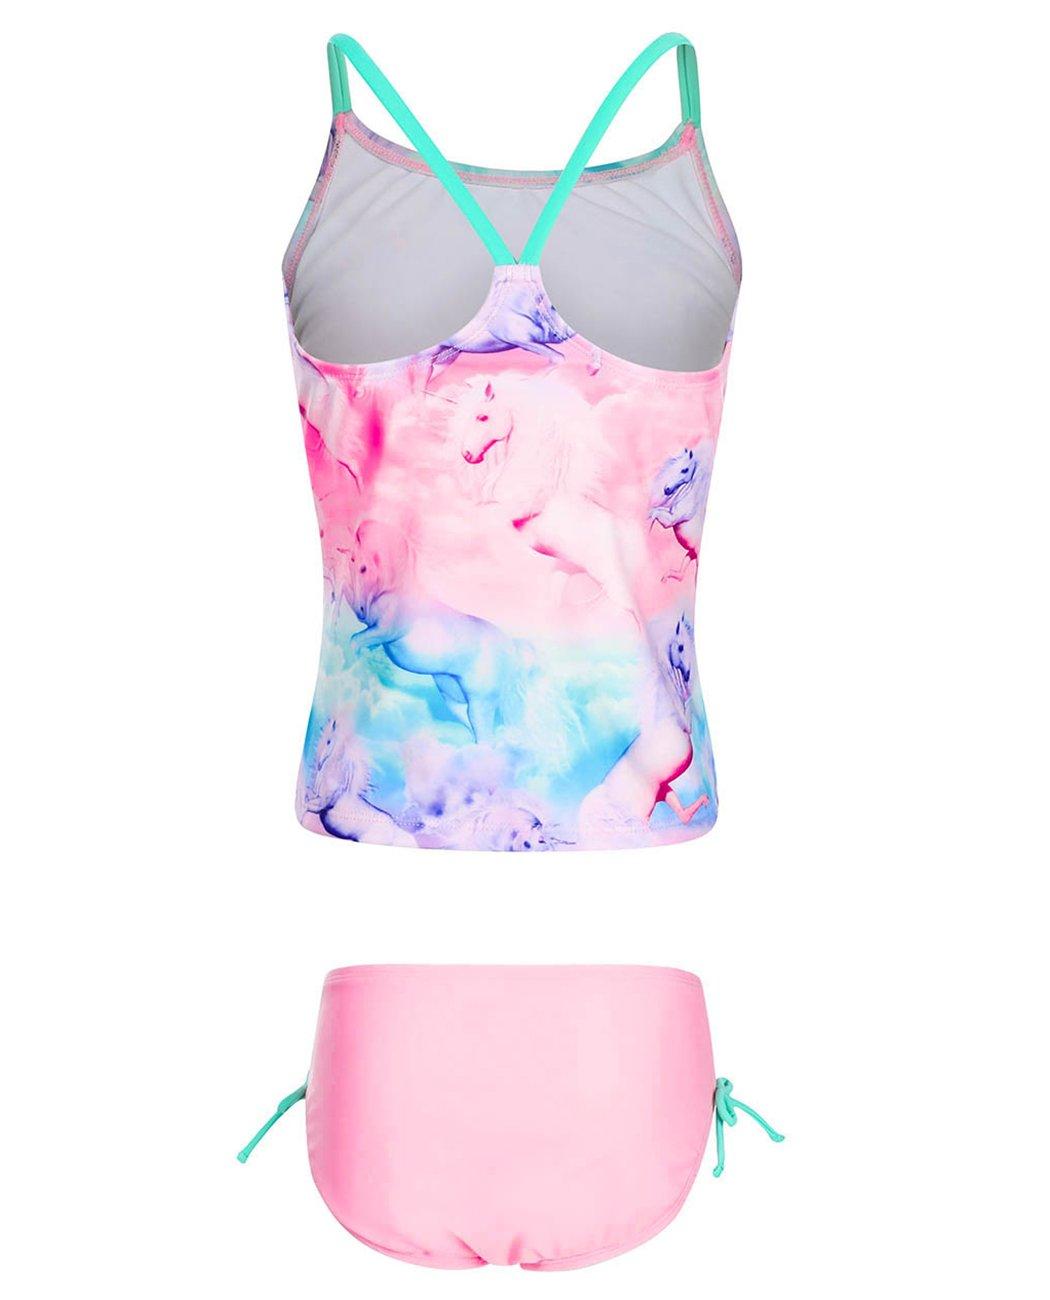 iDrawl Girls Two Piece Swimwear, Racerback Beach Swimming Bathing Suits by iDrawl (Image #2)